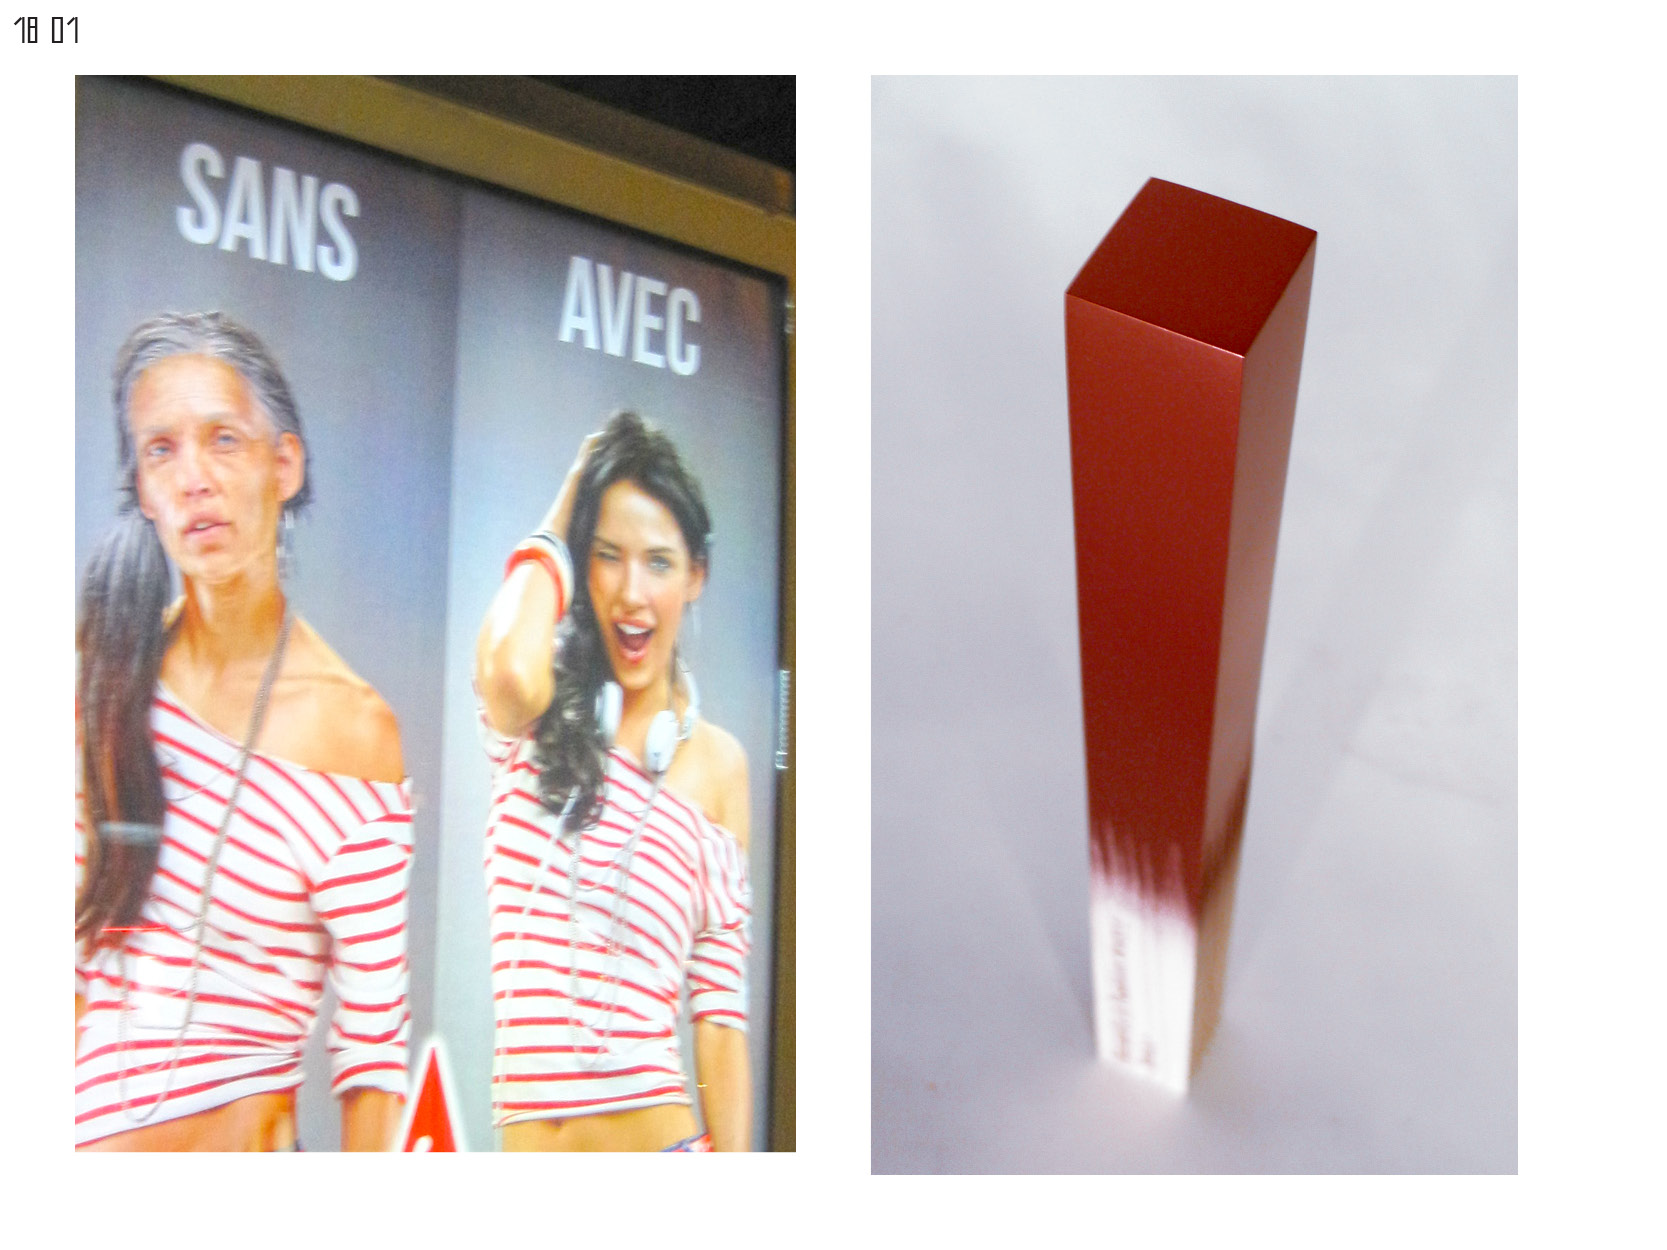 Gerrit-Schweiger-Dialog-Städte-Paris-Berlin-Jessica-Blank-Experiment-Fotoserie-Tagebuch-visuelle-Kommunikation-79